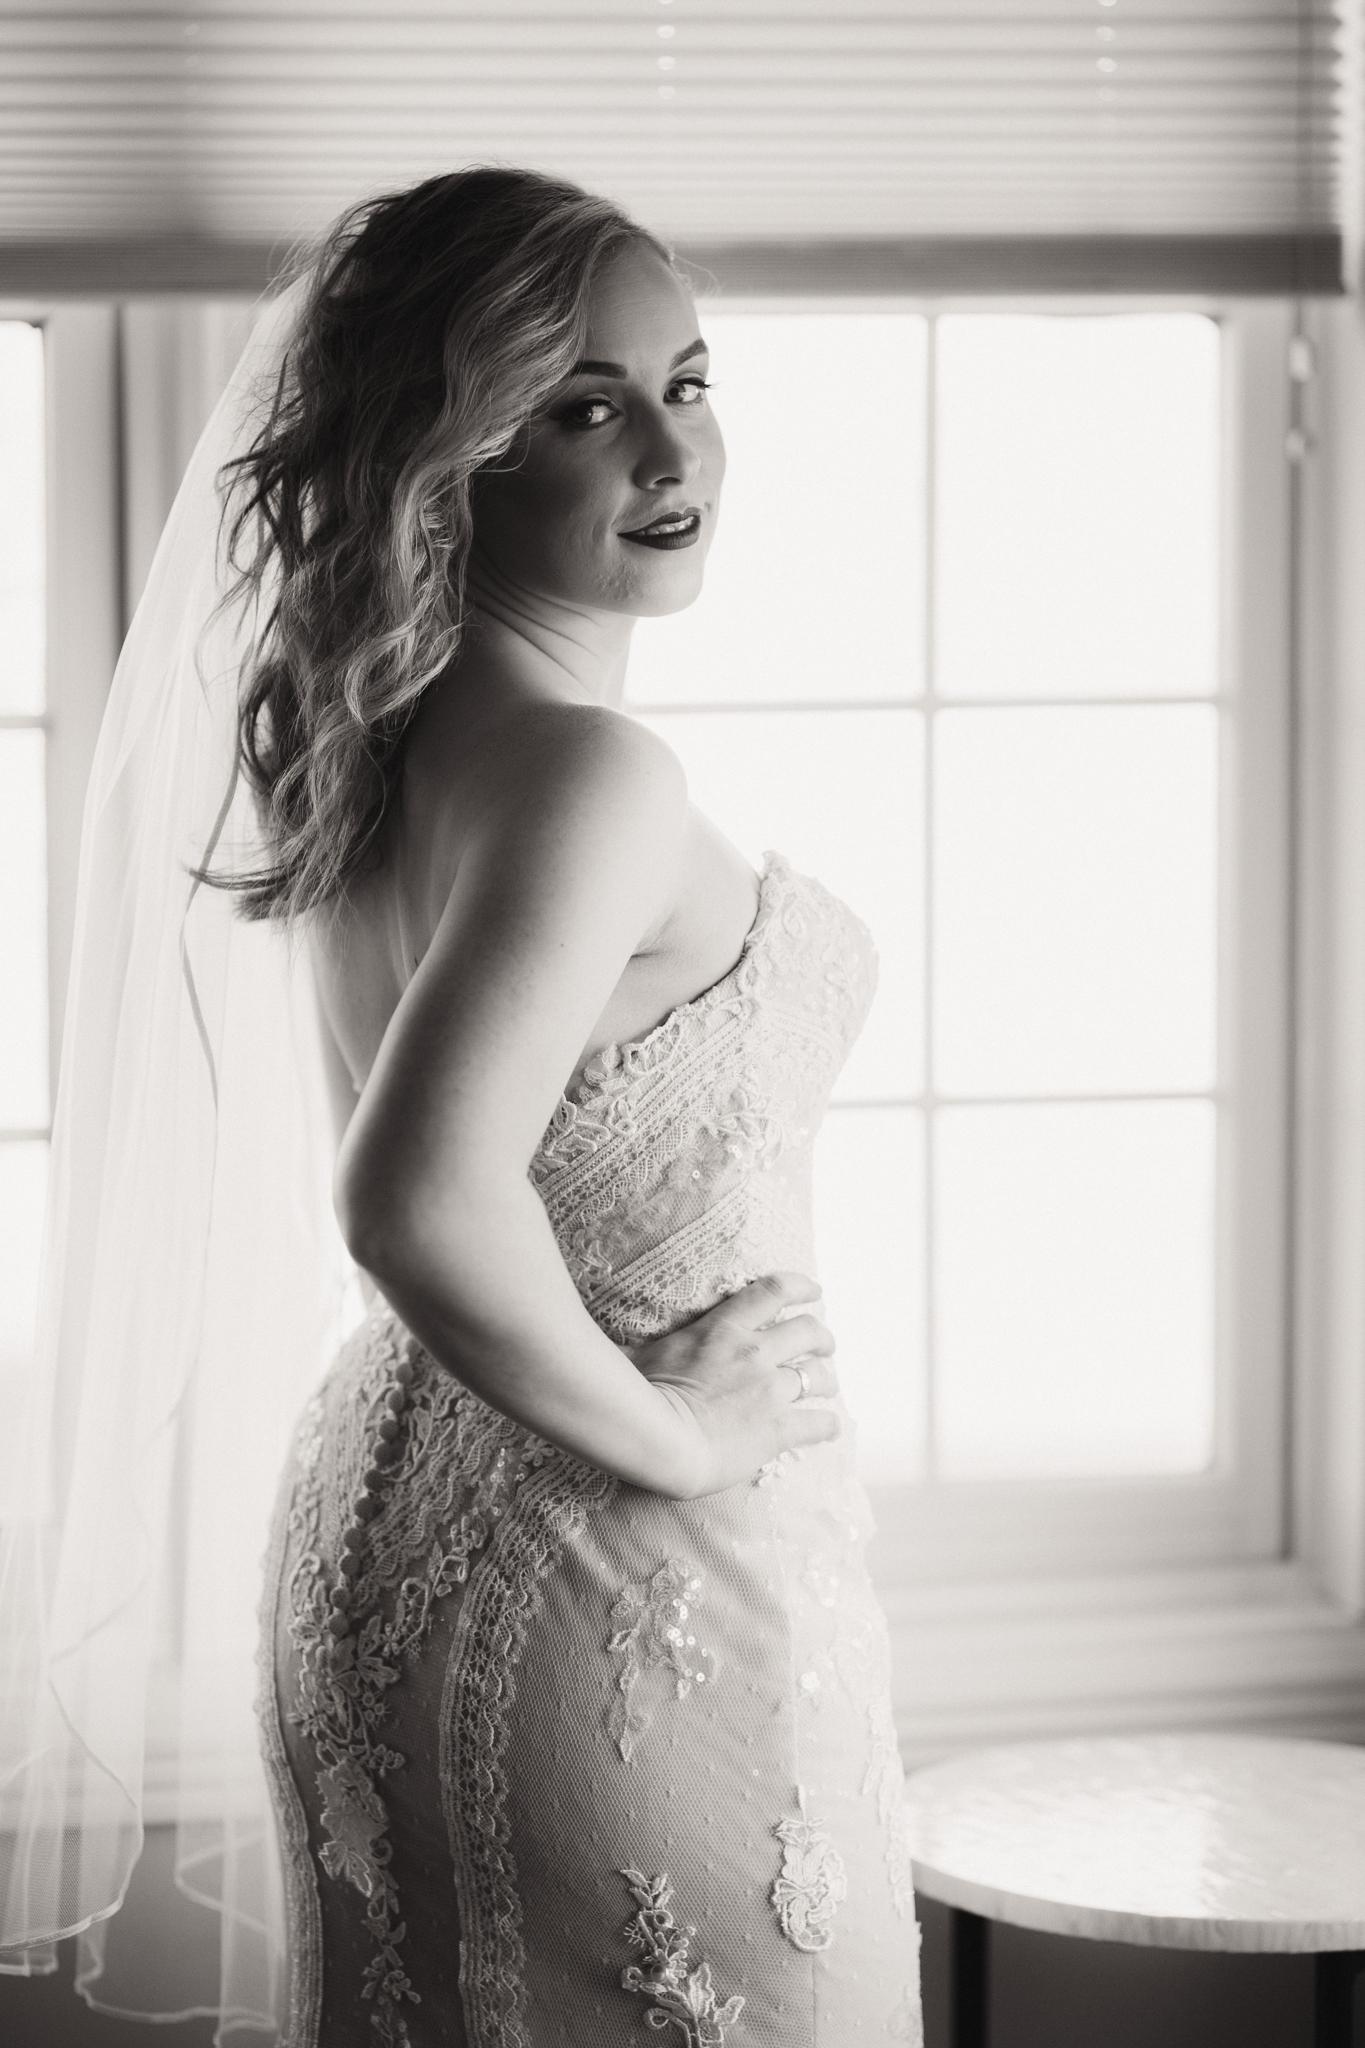 0041 Ariana Jordan Photo - Cameron & Lauren's Wedding at Talon Winery  3699.jpg